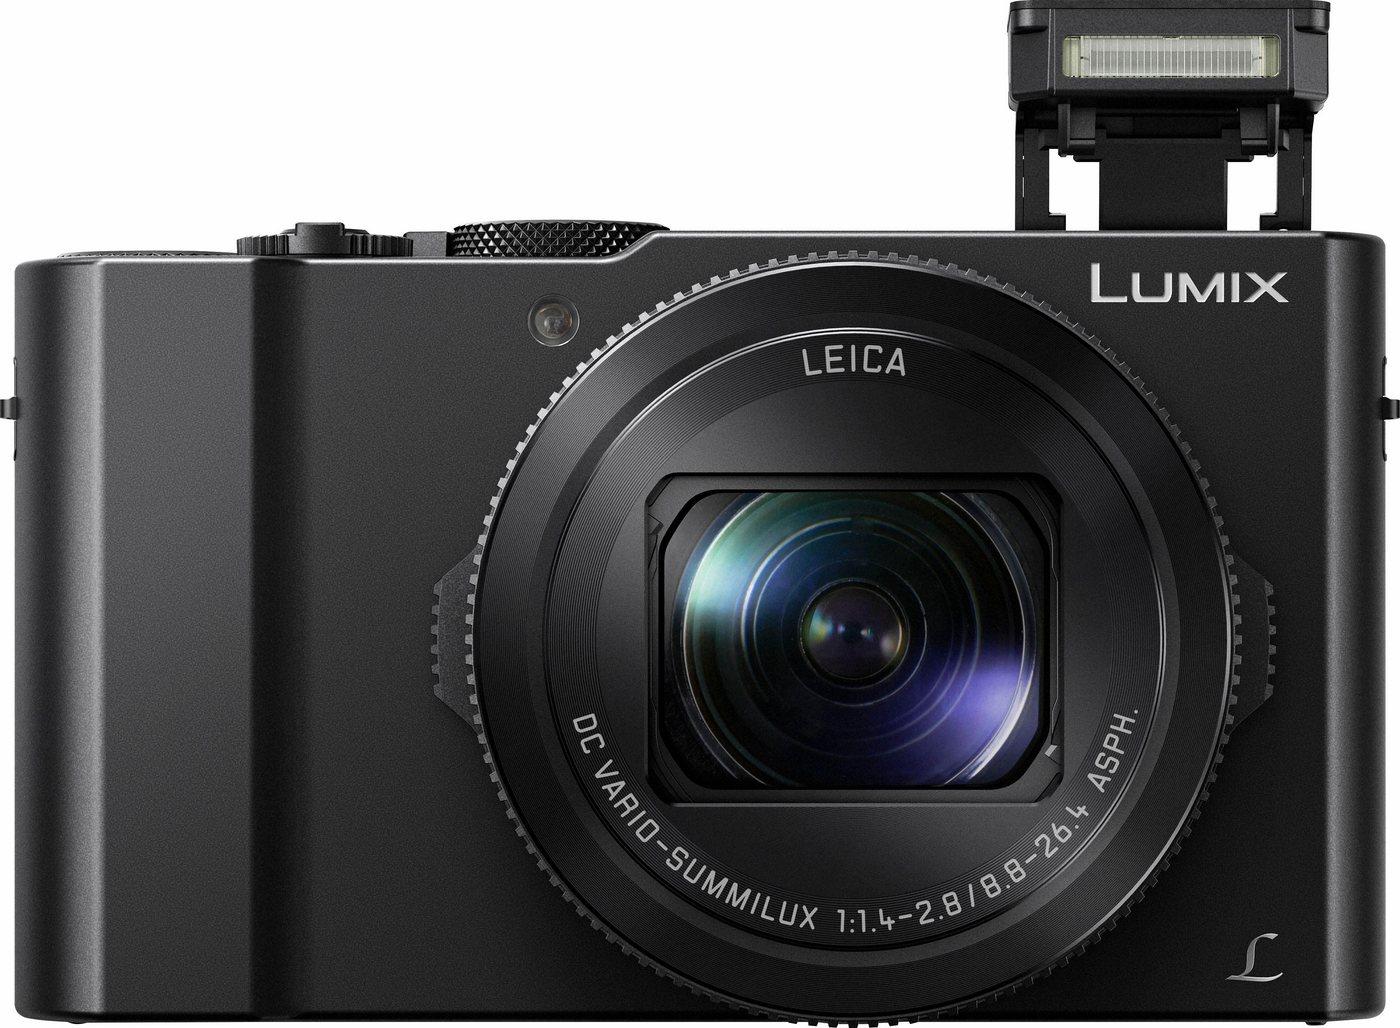 Digitalkameras - Lumix Panasonic »DMC LX15EG K« Kompaktkamera (LEICA DC VARIO SUMMILUX, 20,1 MP, 3x opt. Zoom, HDR Aufnahme, Gesichtserkennung)  - Onlineshop OTTO